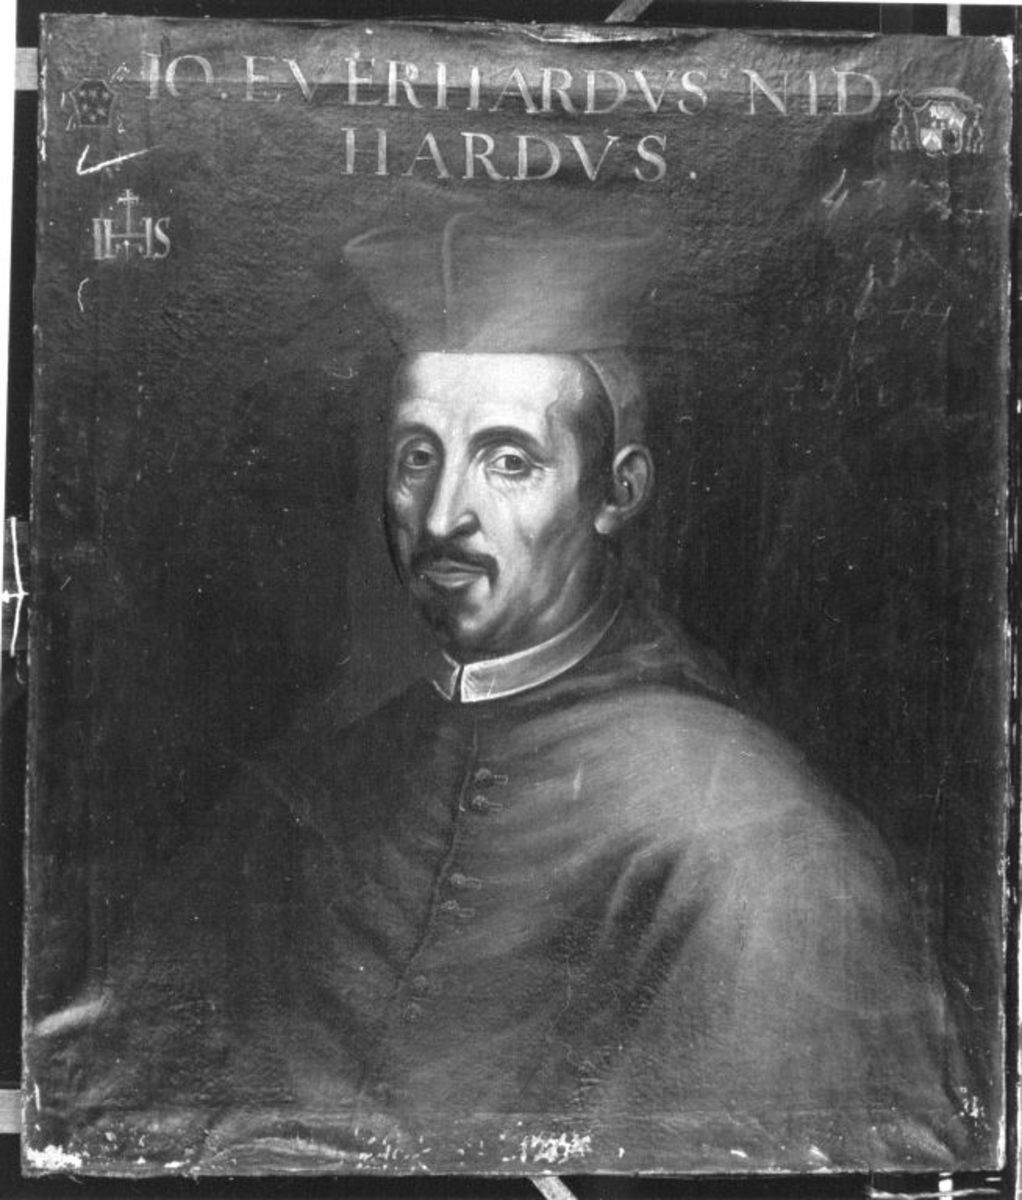 Jesuitenkardinal I o. Eberhard Nidhardus